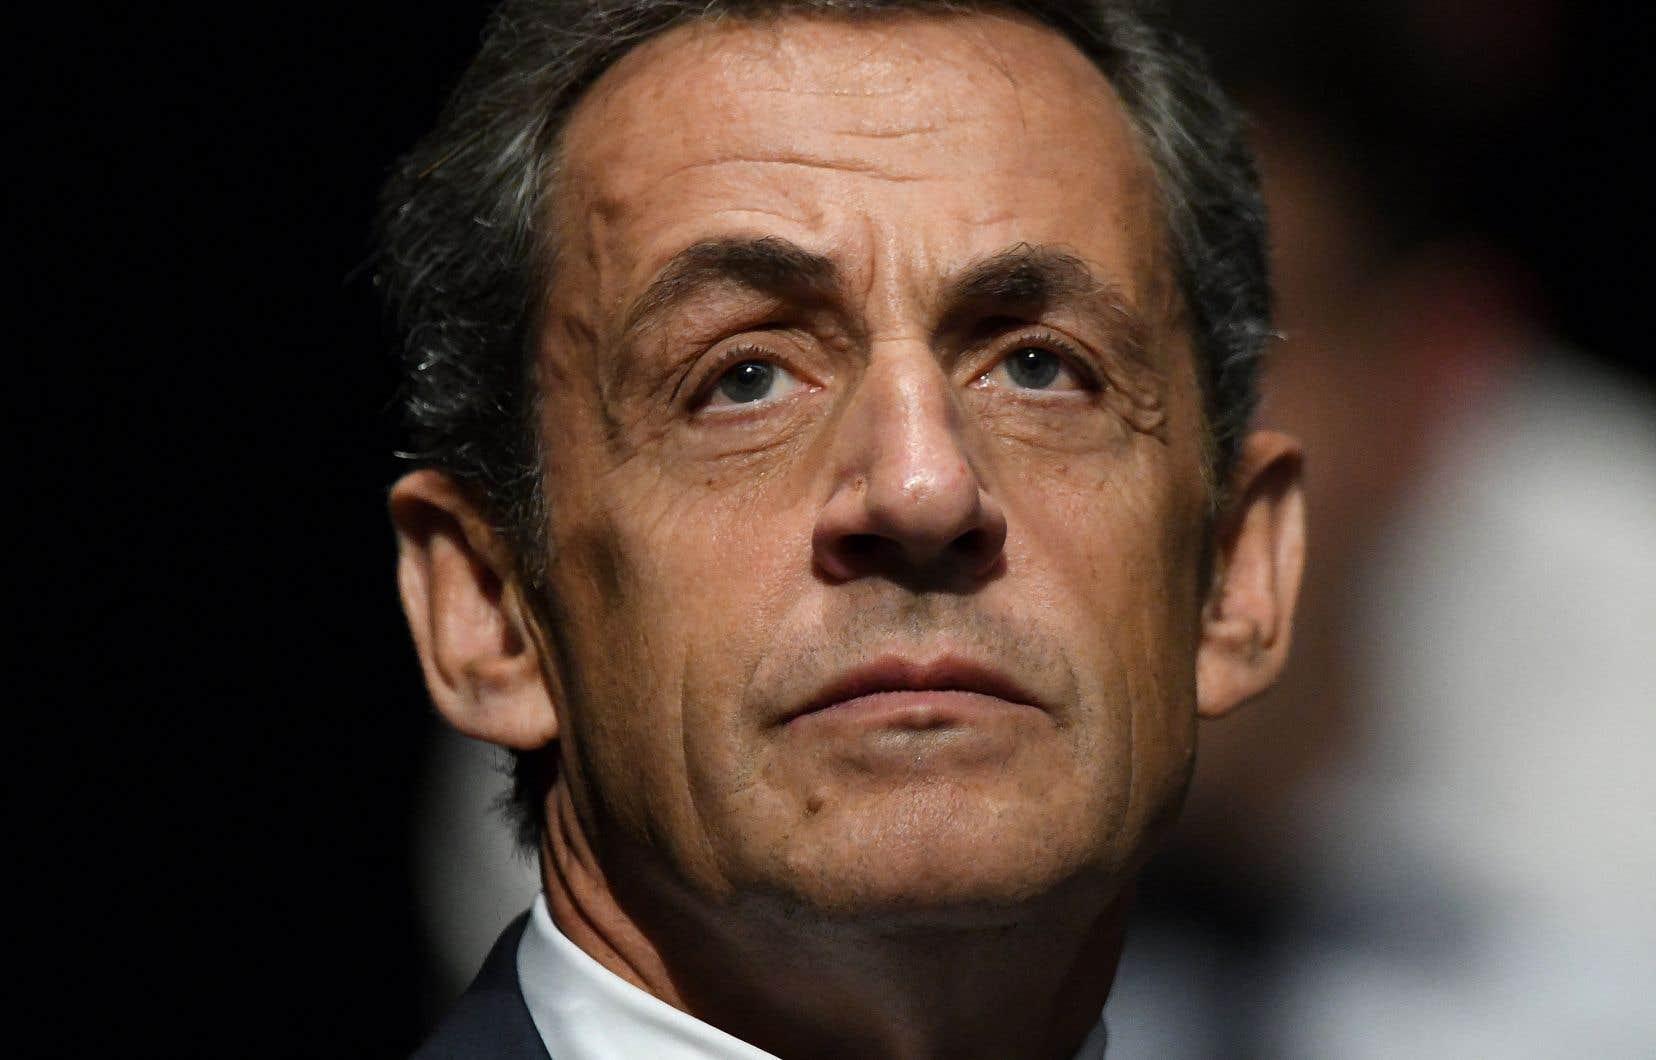 Nicolas Sarkozy n'ira pas en prison. Sa peine sera directement aménagée, a précisé le tribunal.